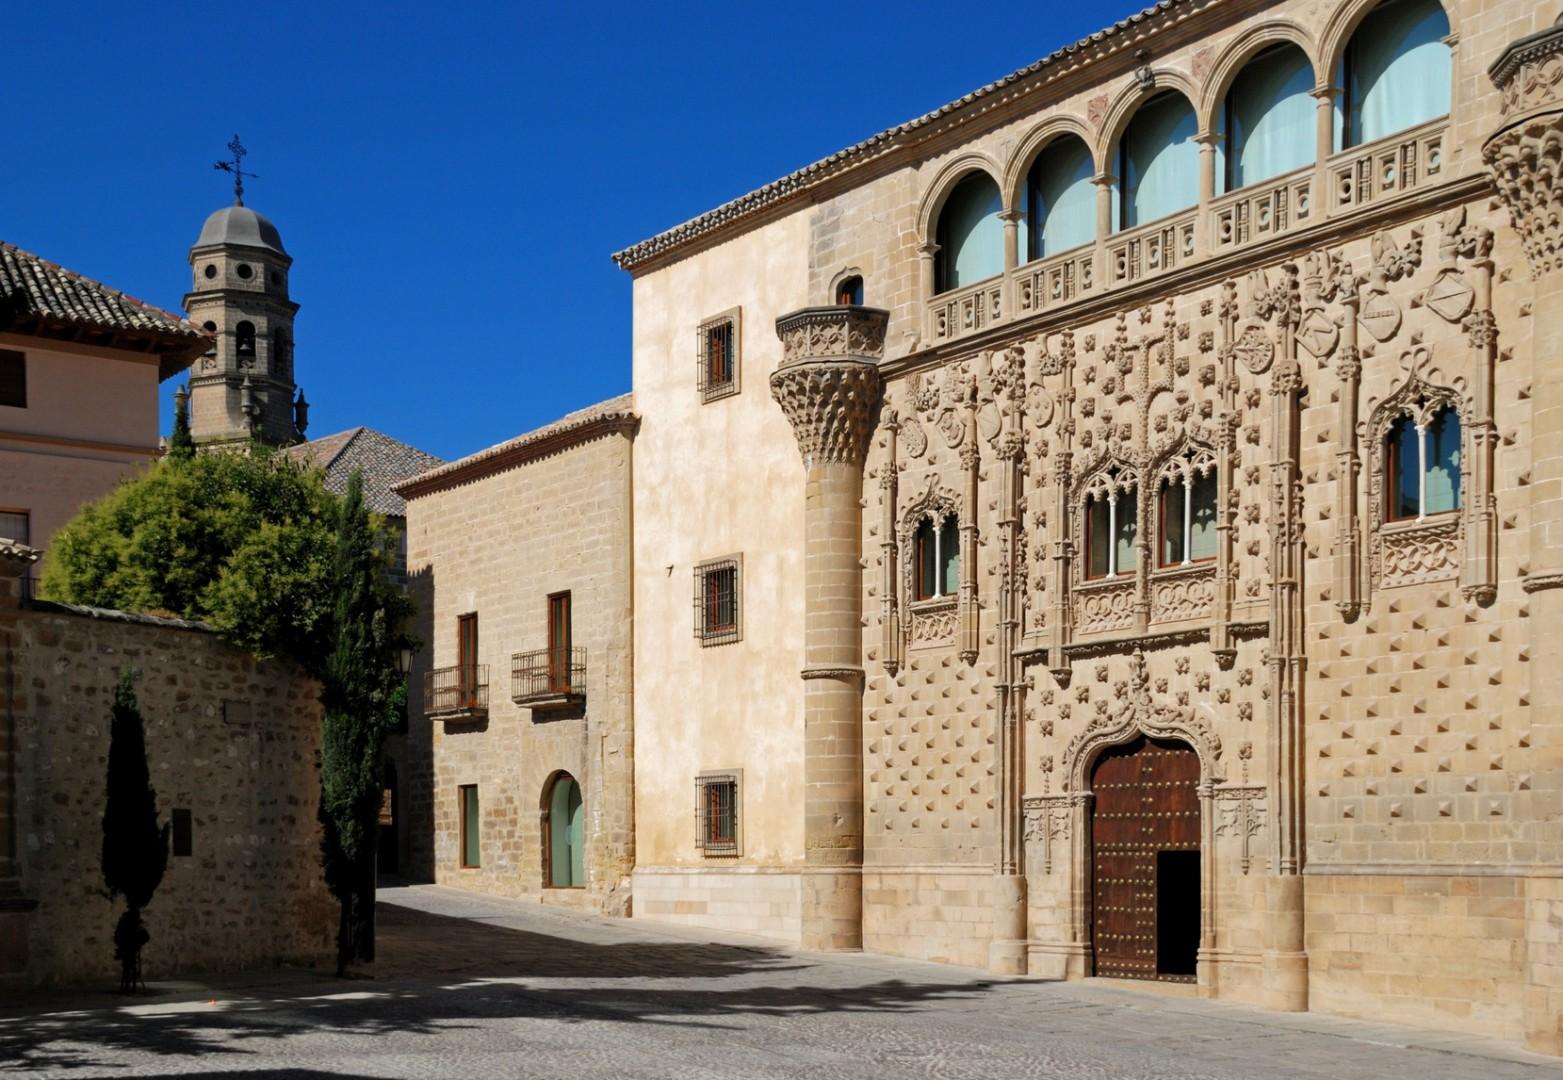 pueblos andaluces con encanto Jabalquinto Palace, Baeza, Spain © Arena Photo UK